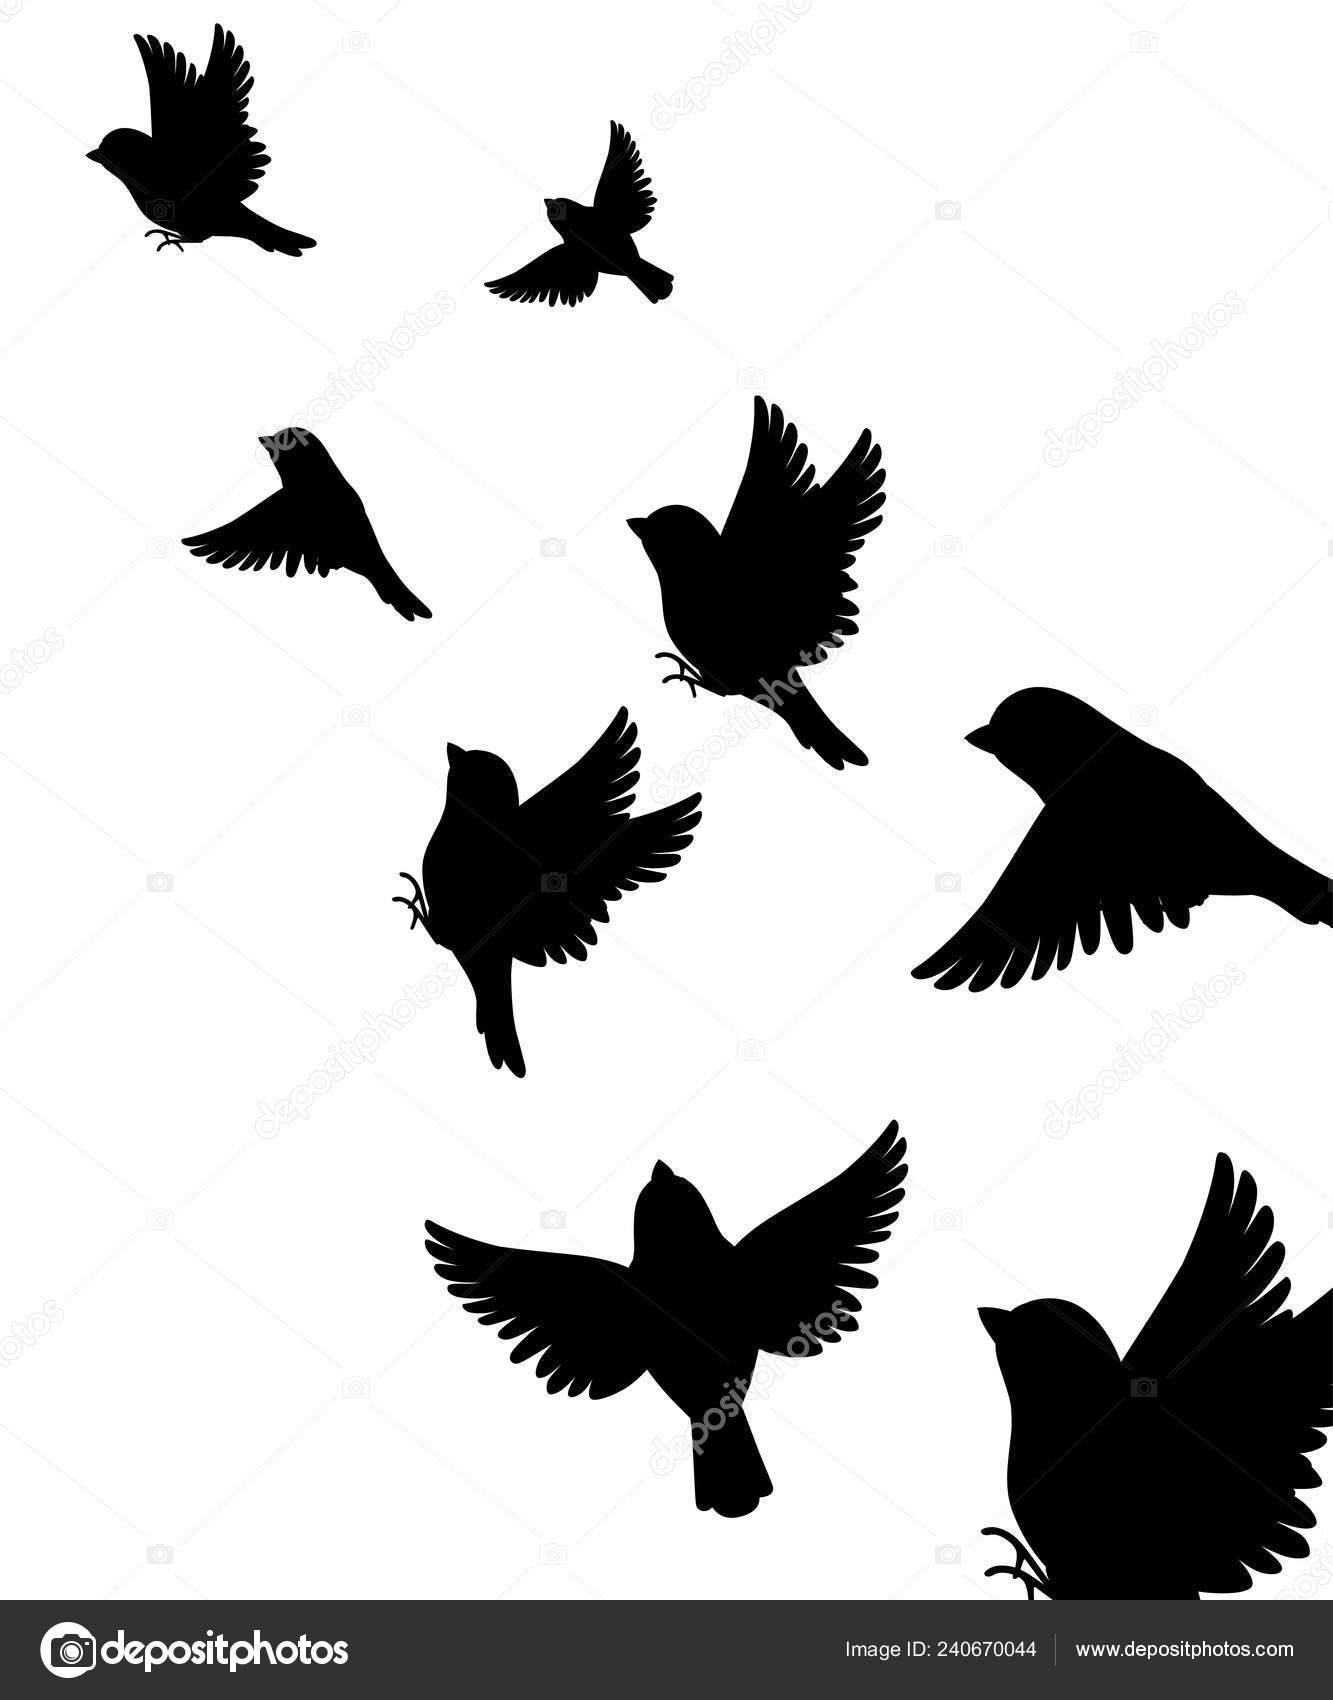 Aninimal Book: Abstract Illustration Many Sparrow Bird Flying Black ...